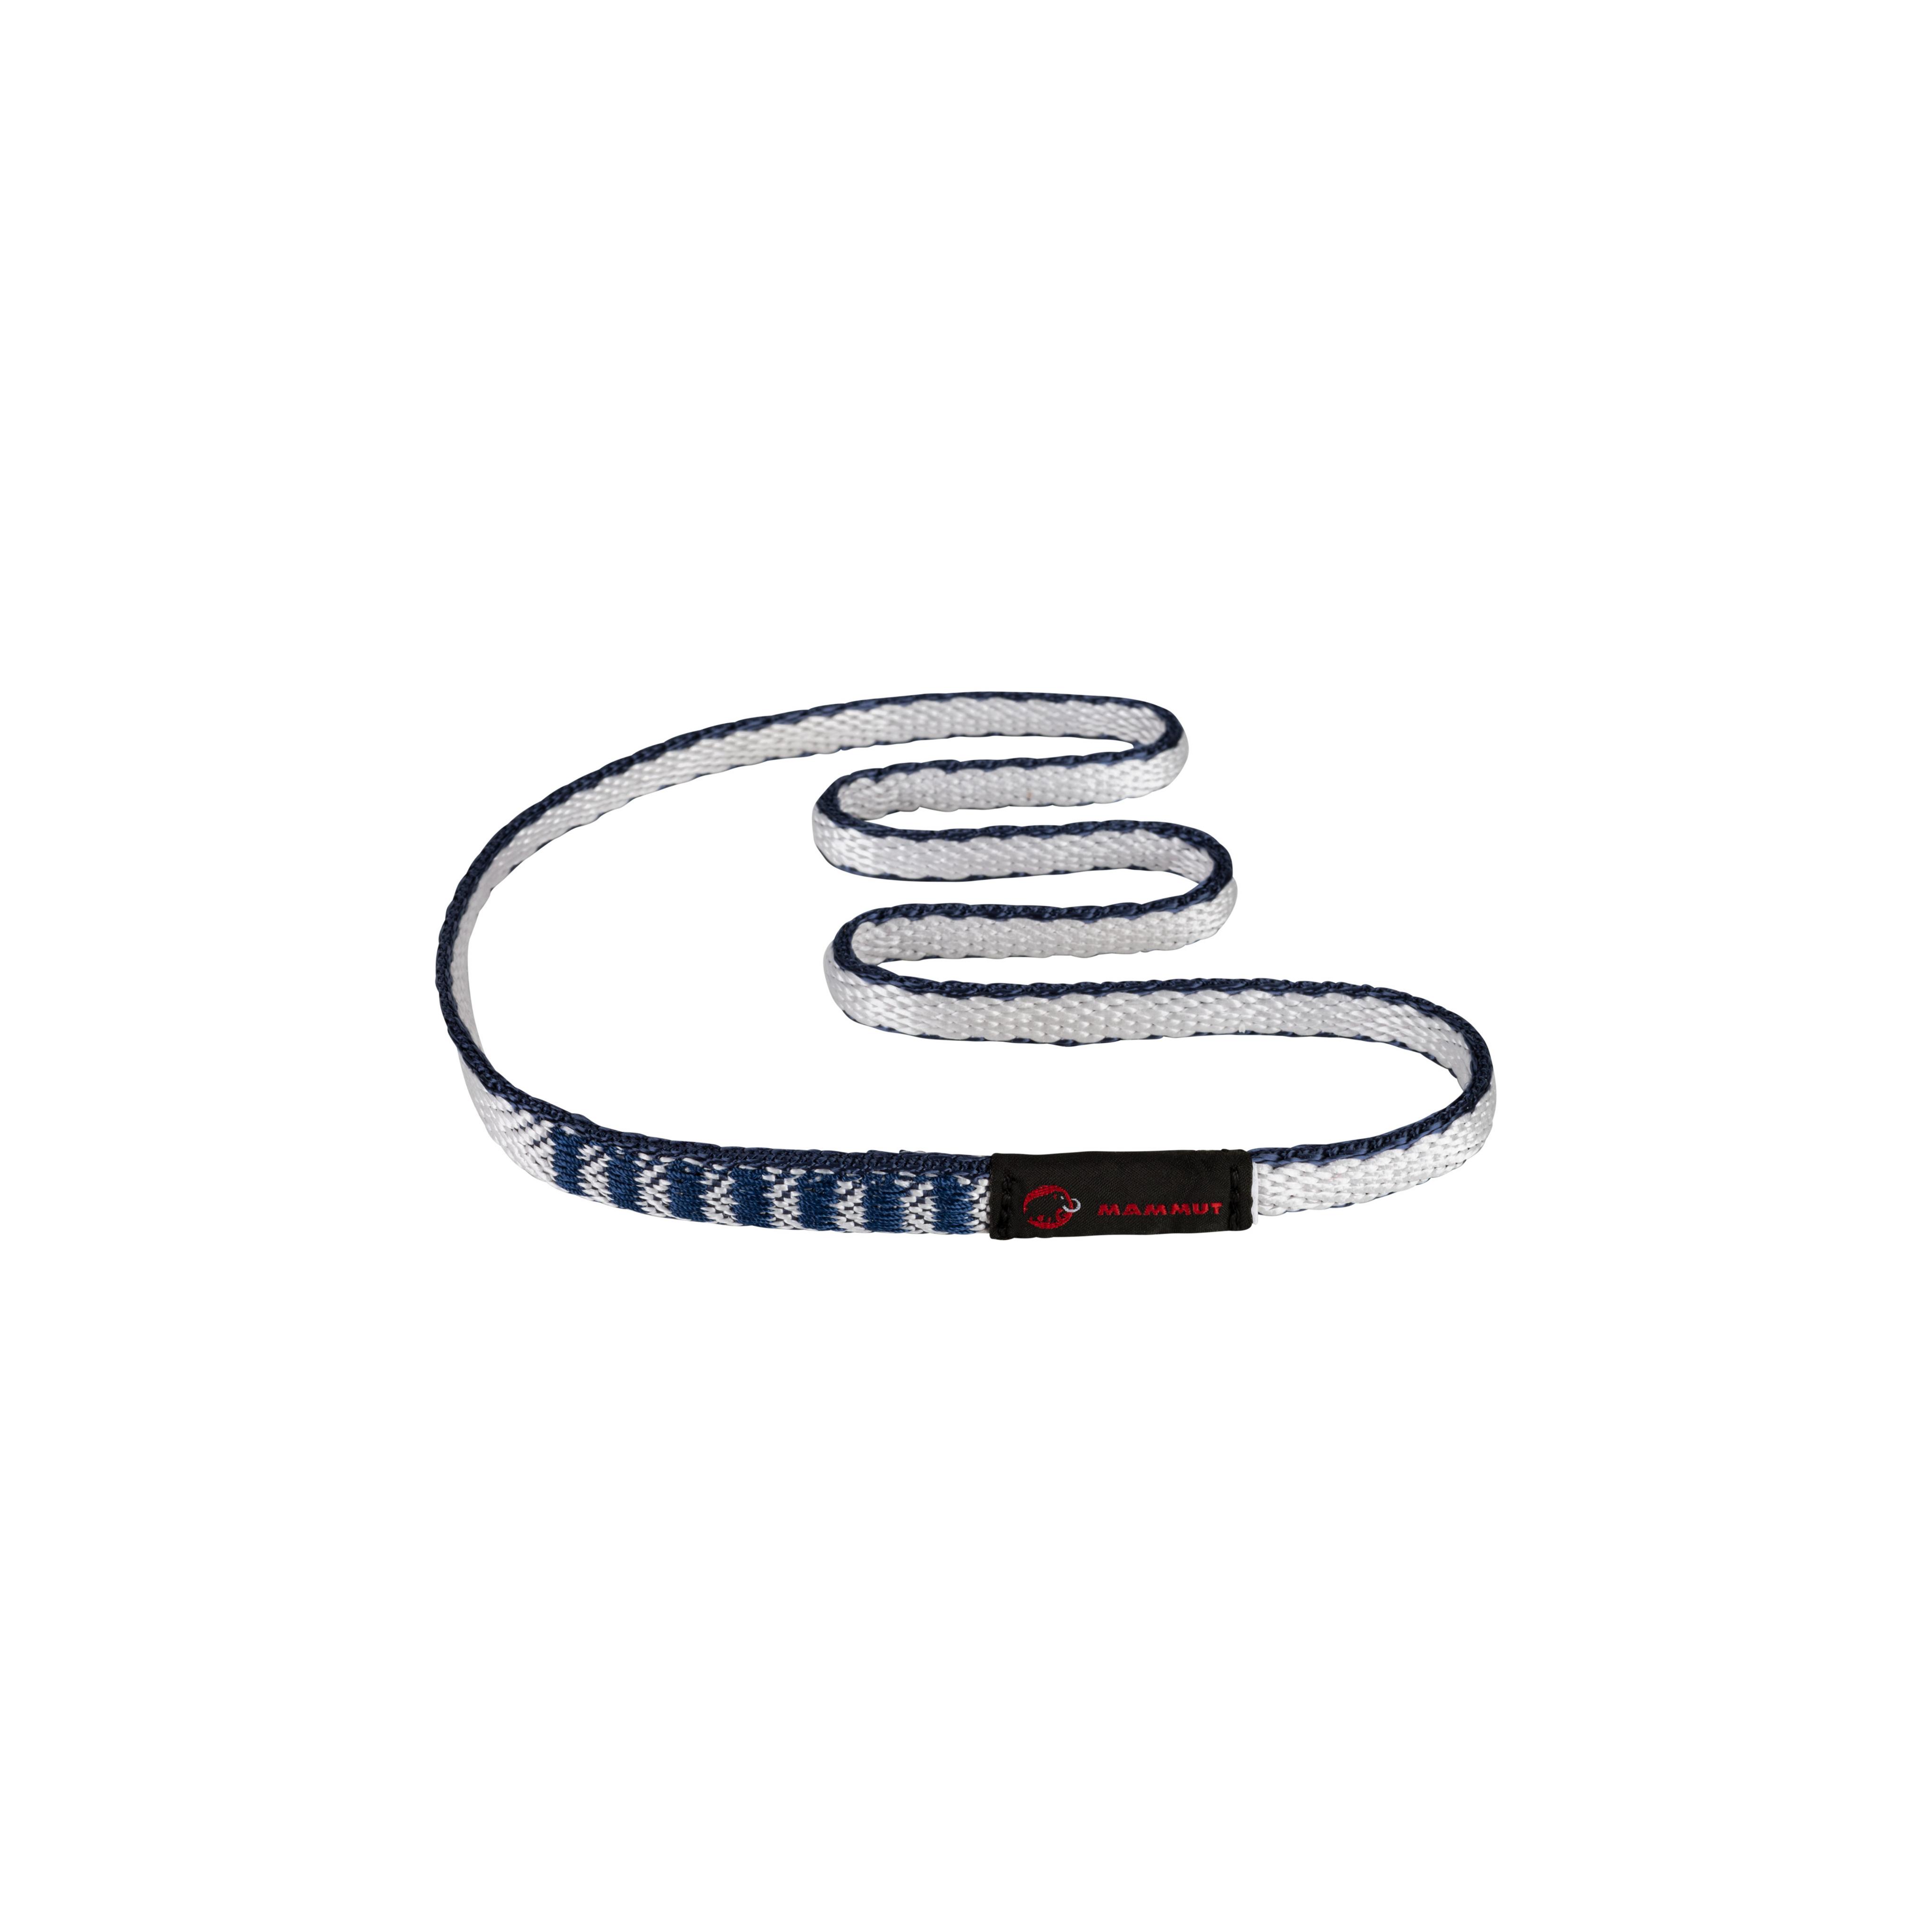 Contact Sling 8.0 - 240 cm, dark blue thumbnail